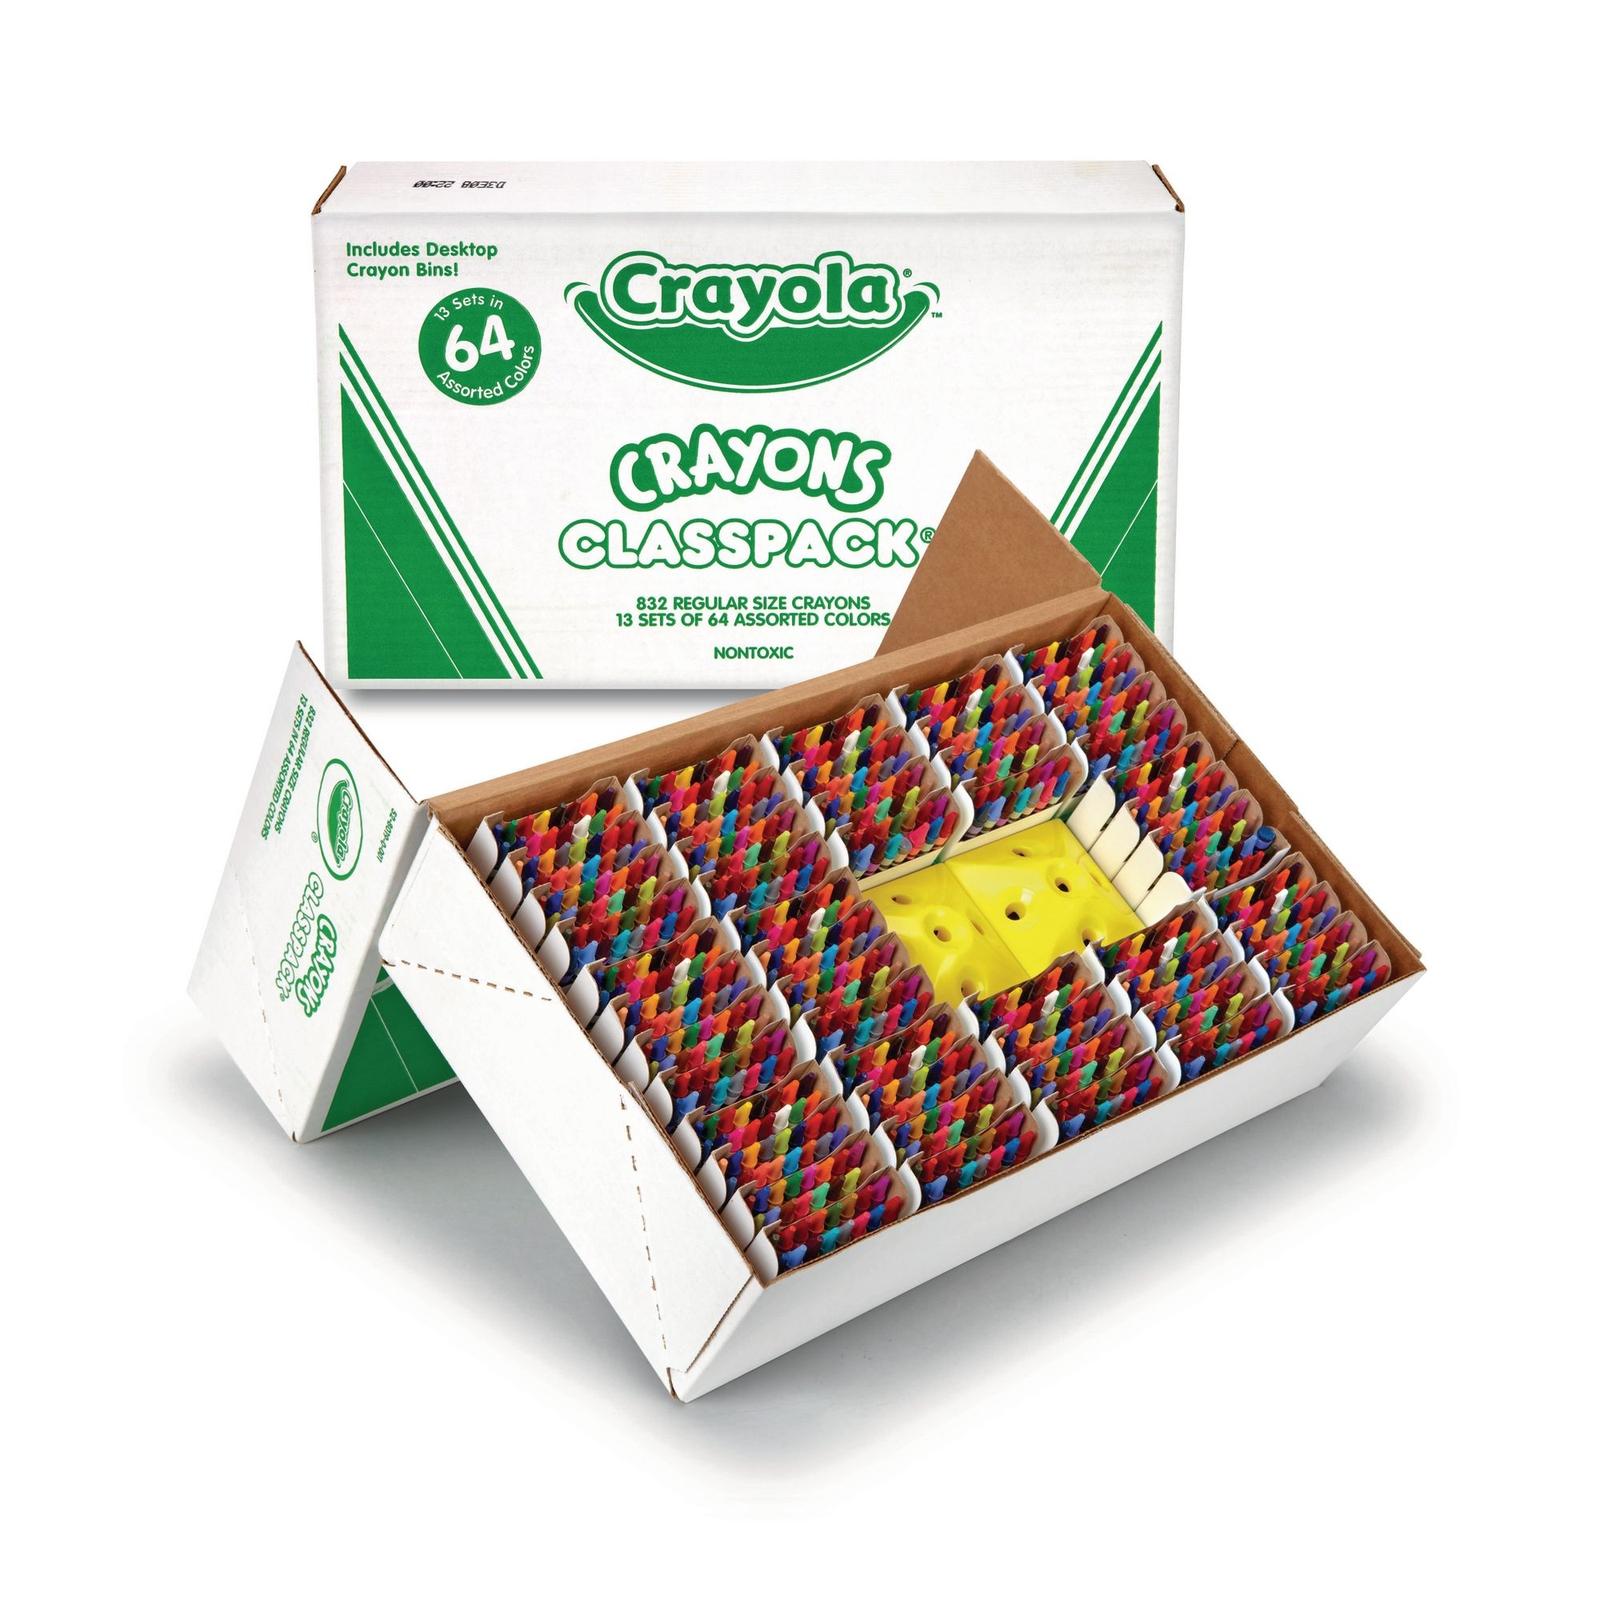 Crayola Crayon Classpack Pack of 832